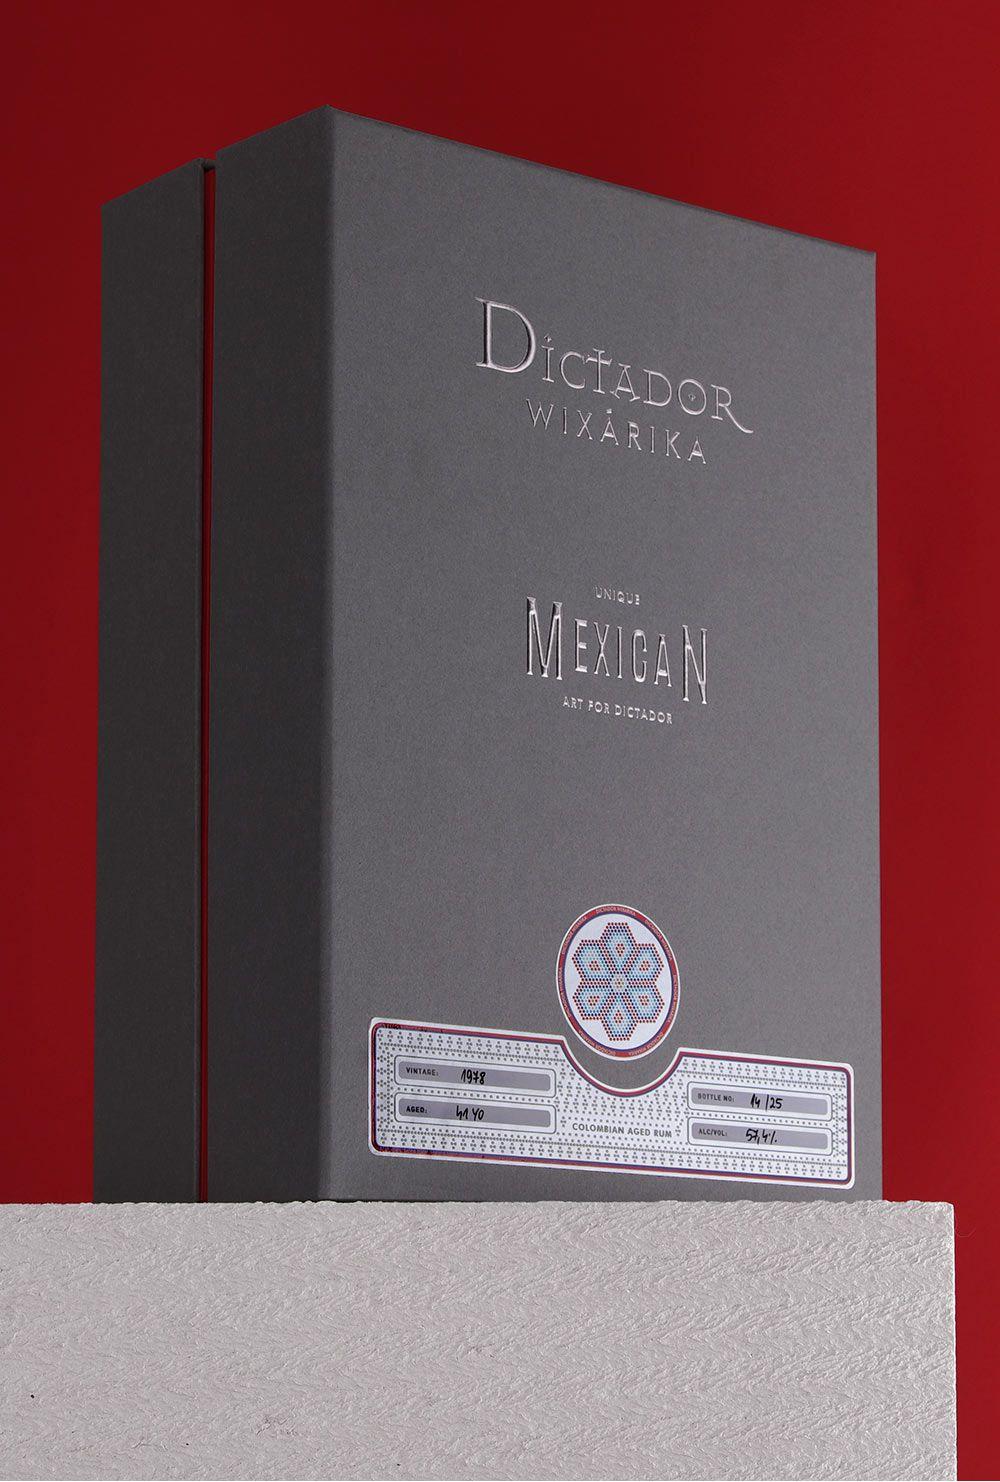 Dictador Wixarika | Model 2018/3